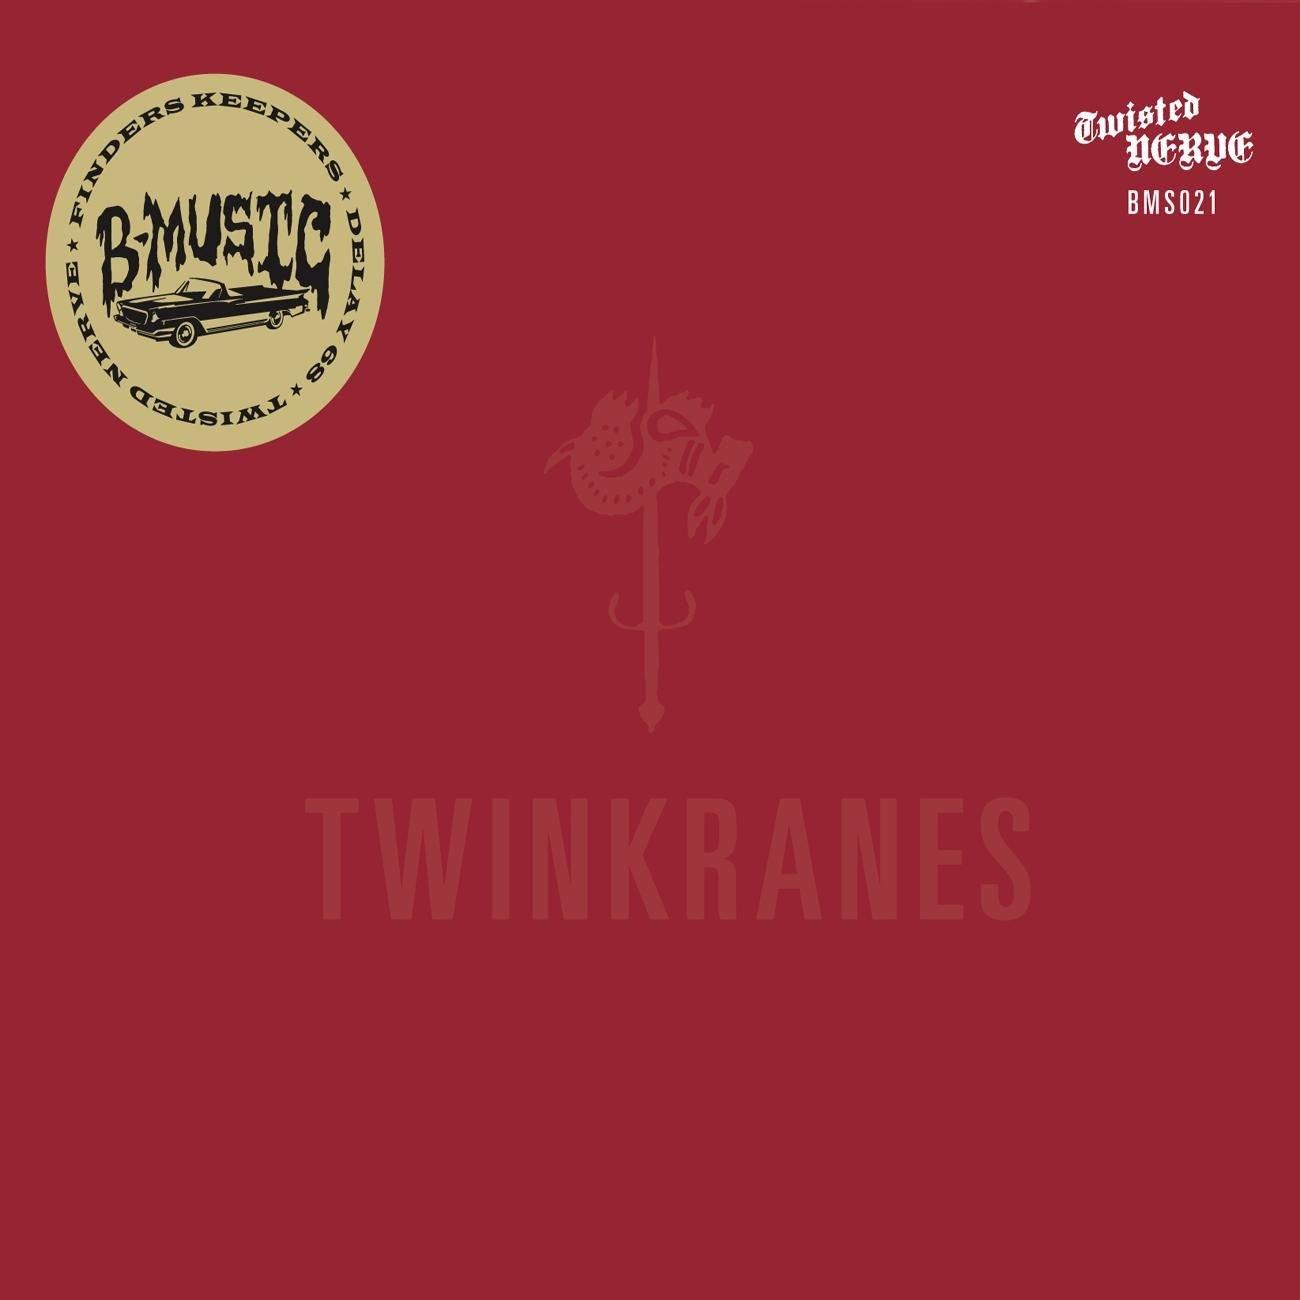 Twinkranes album Spektrumtheatresnakes